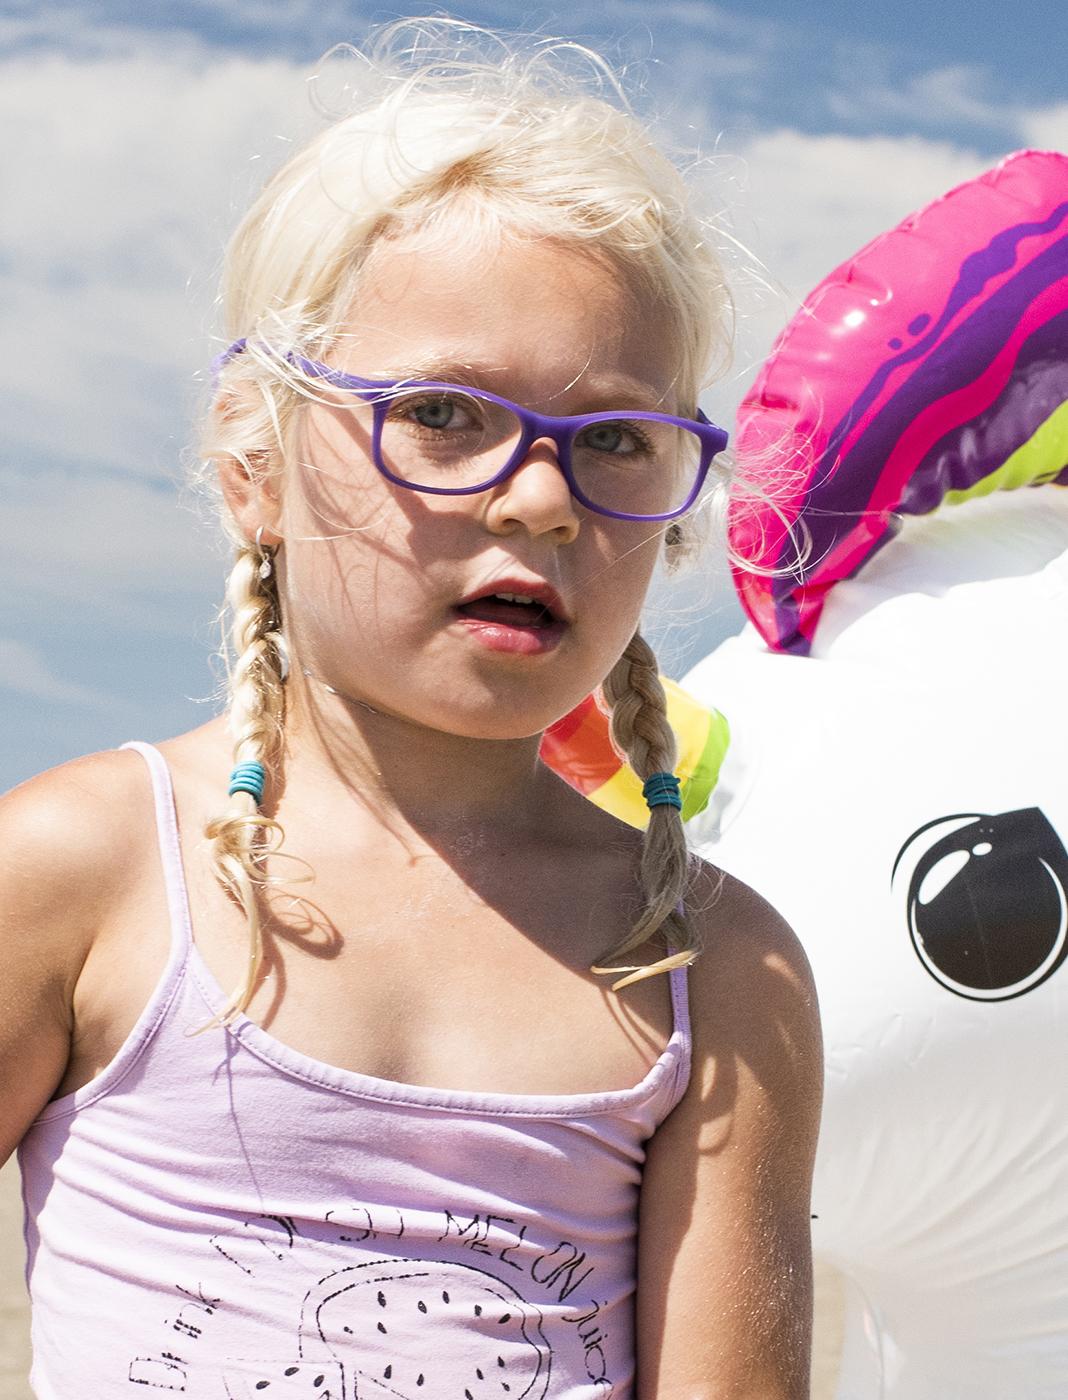 305a00b74c Milo Me  Cool kids wear Cool eyewear - TEF Magazine